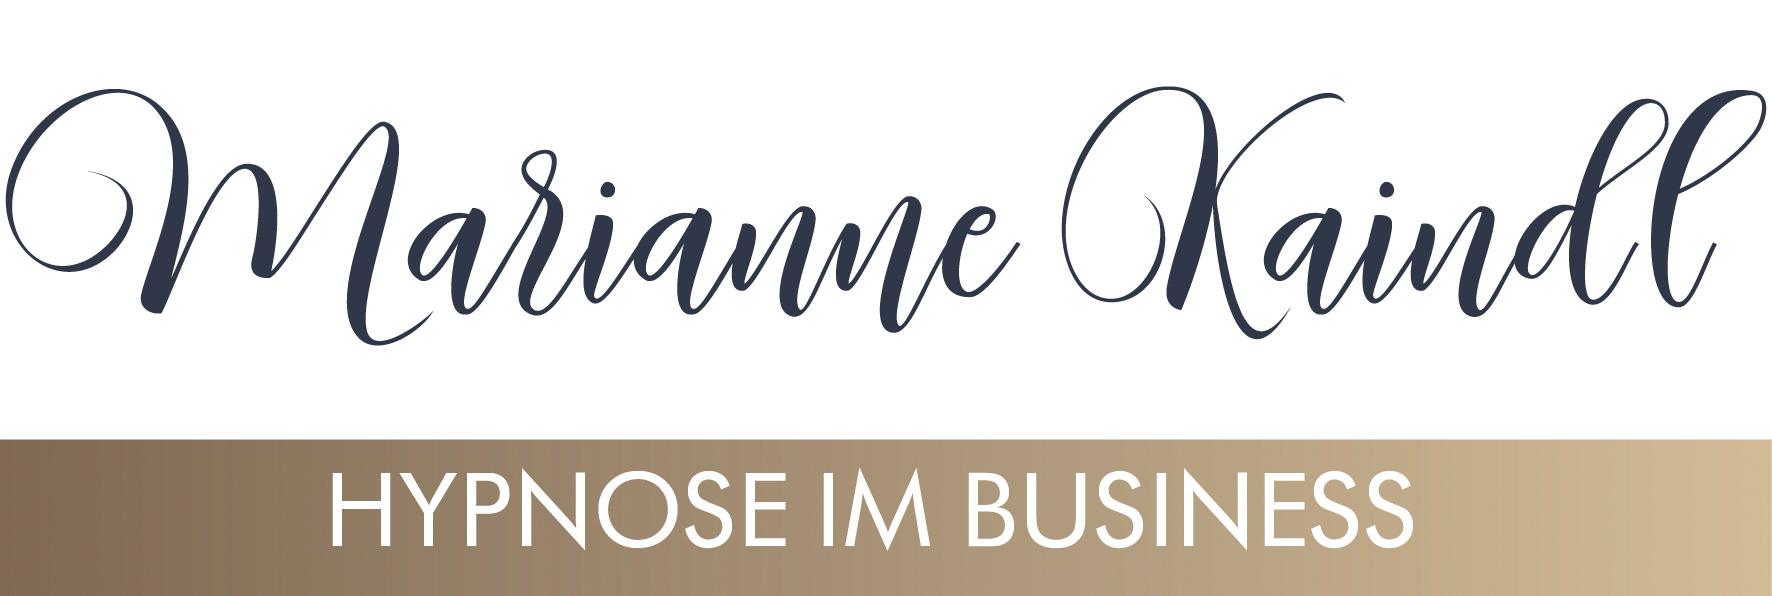 Marianne Kaindl - Hypnose im Business